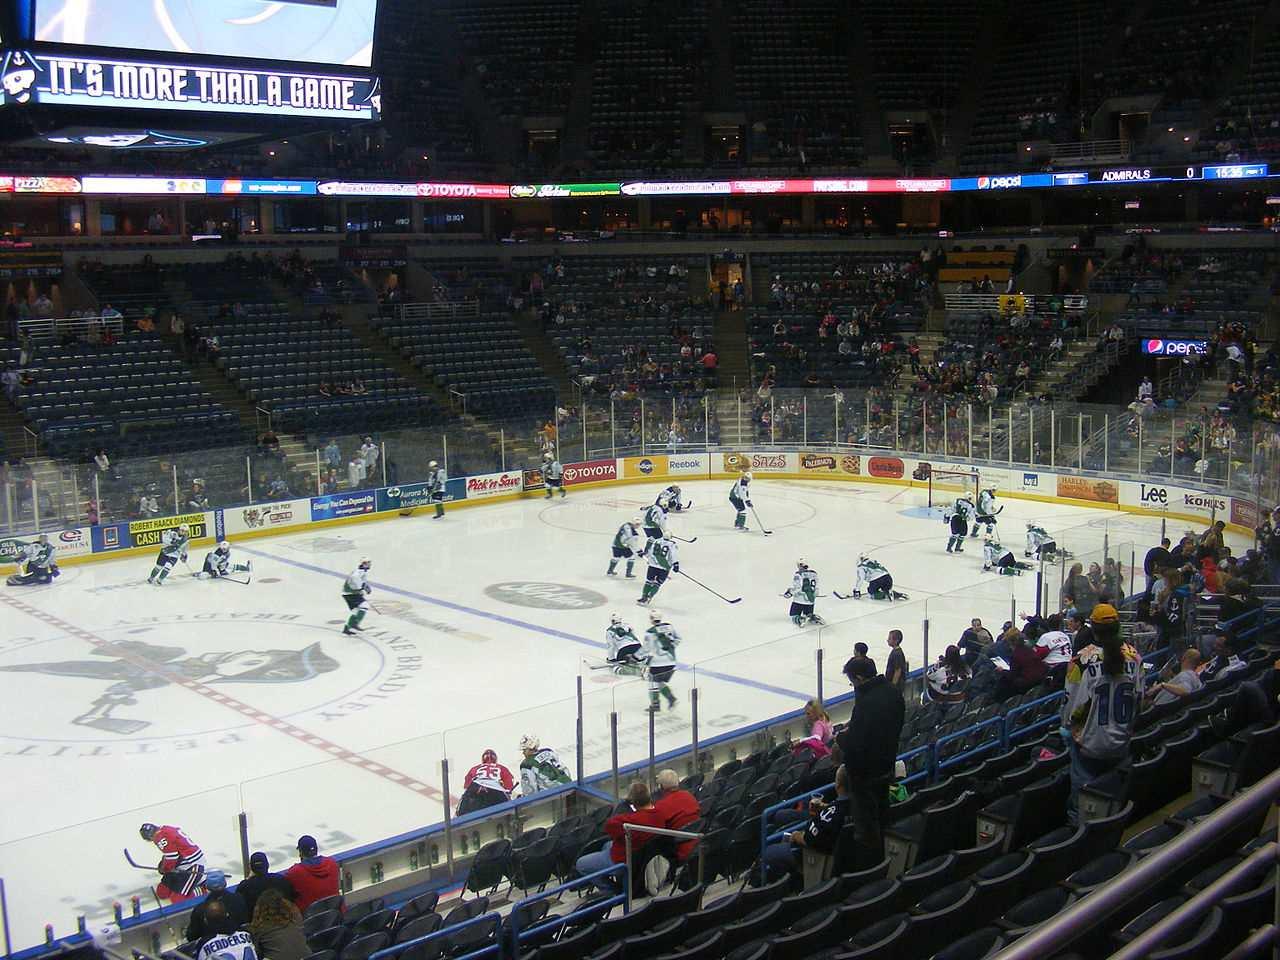 The BMO Harris Bradley center during a Milwaukee Admirals game